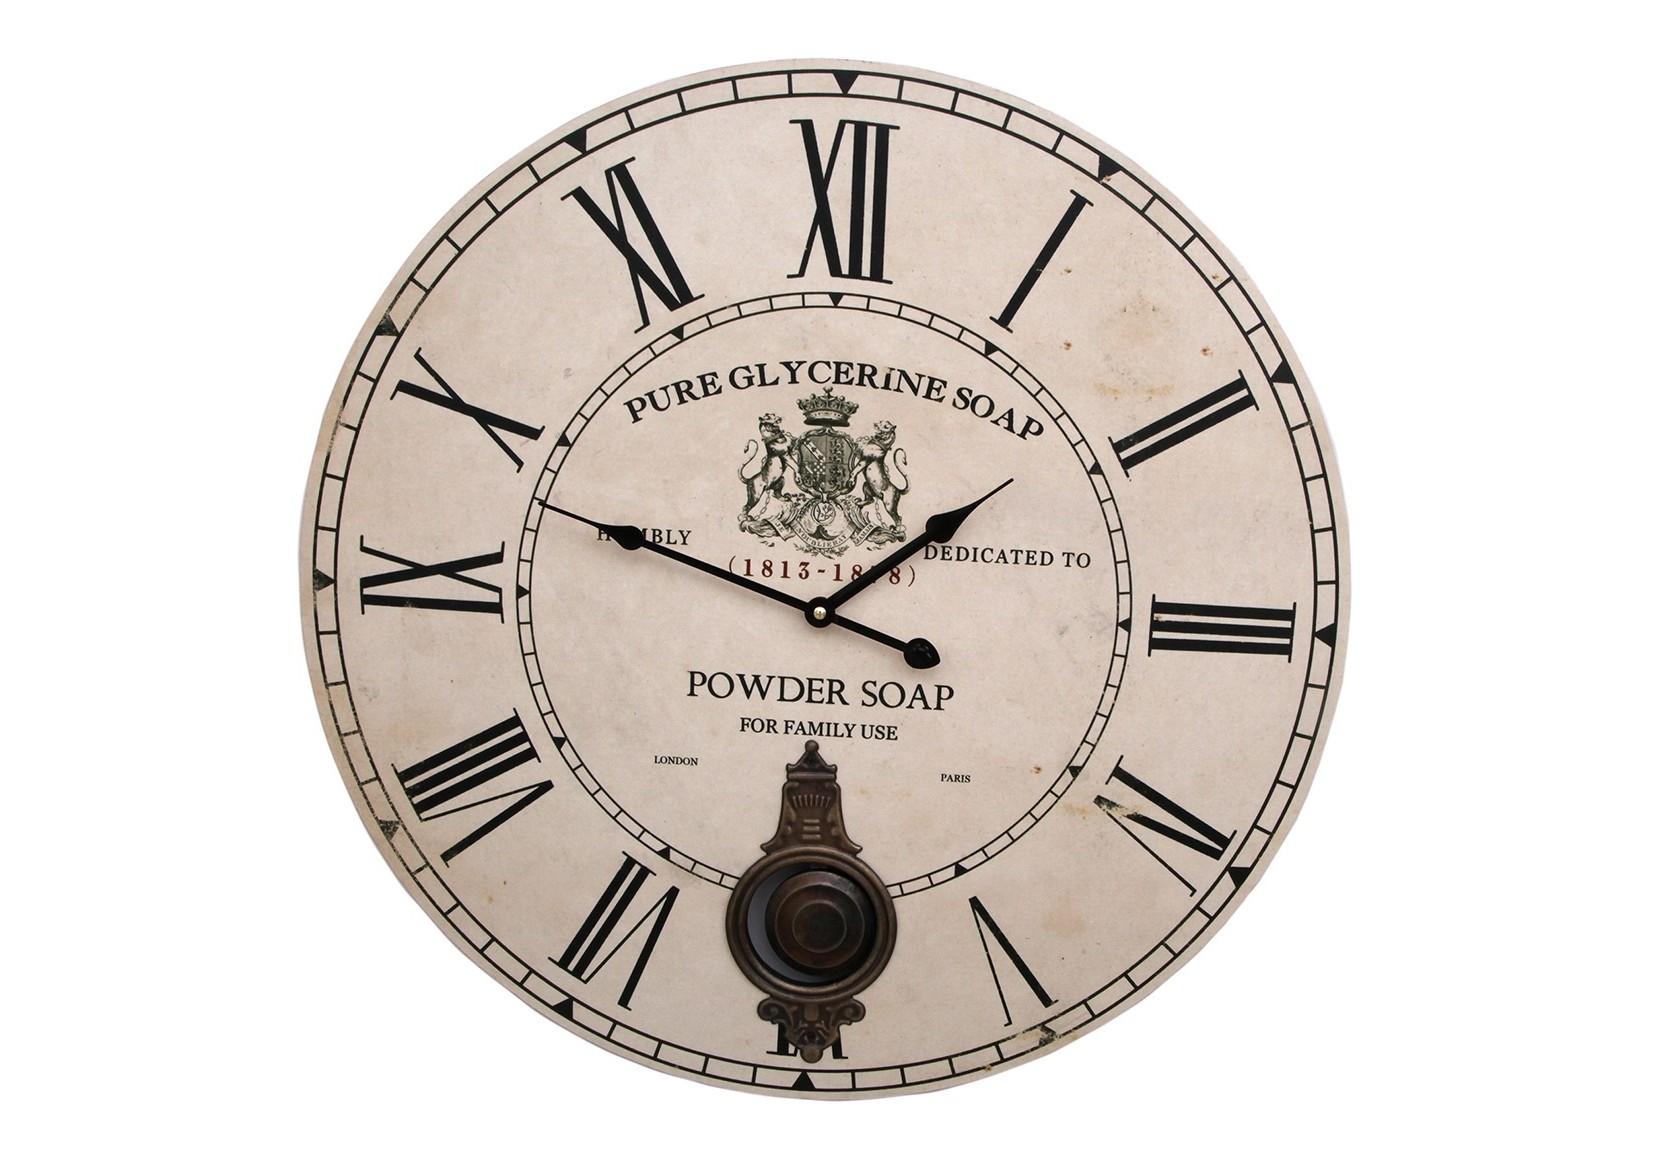 ЧасыНастенные часы<br>кварцевый механизм<br><br>Material: Дерево<br>Высота см: 1